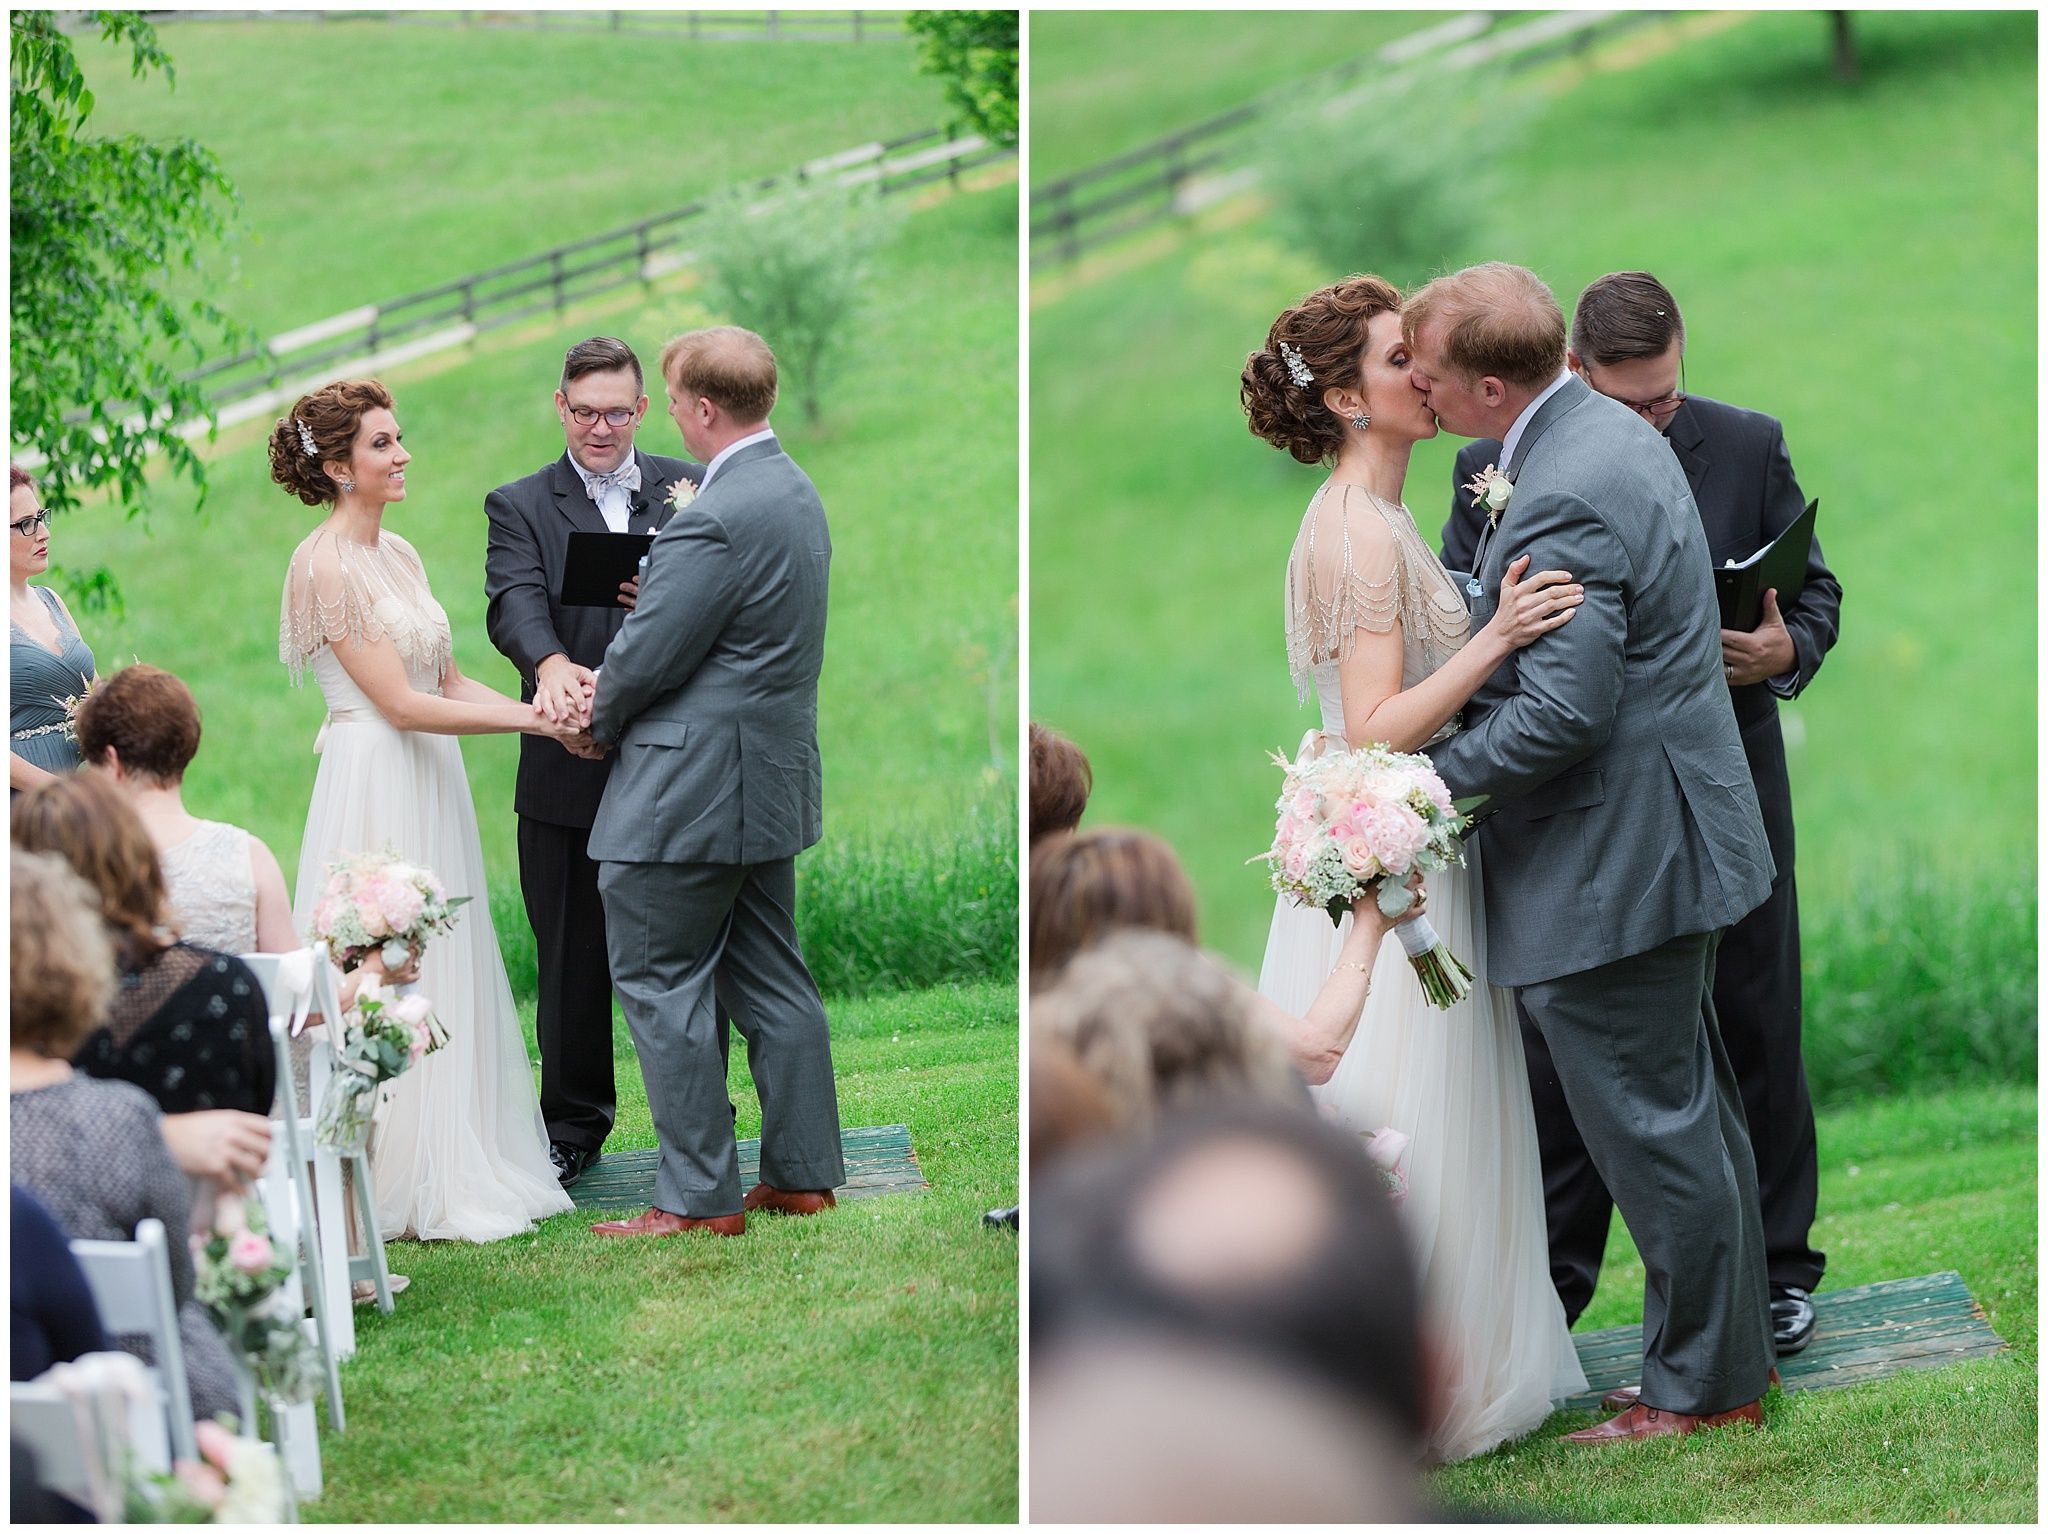 Wedding_Courtney_David_0062.jpg